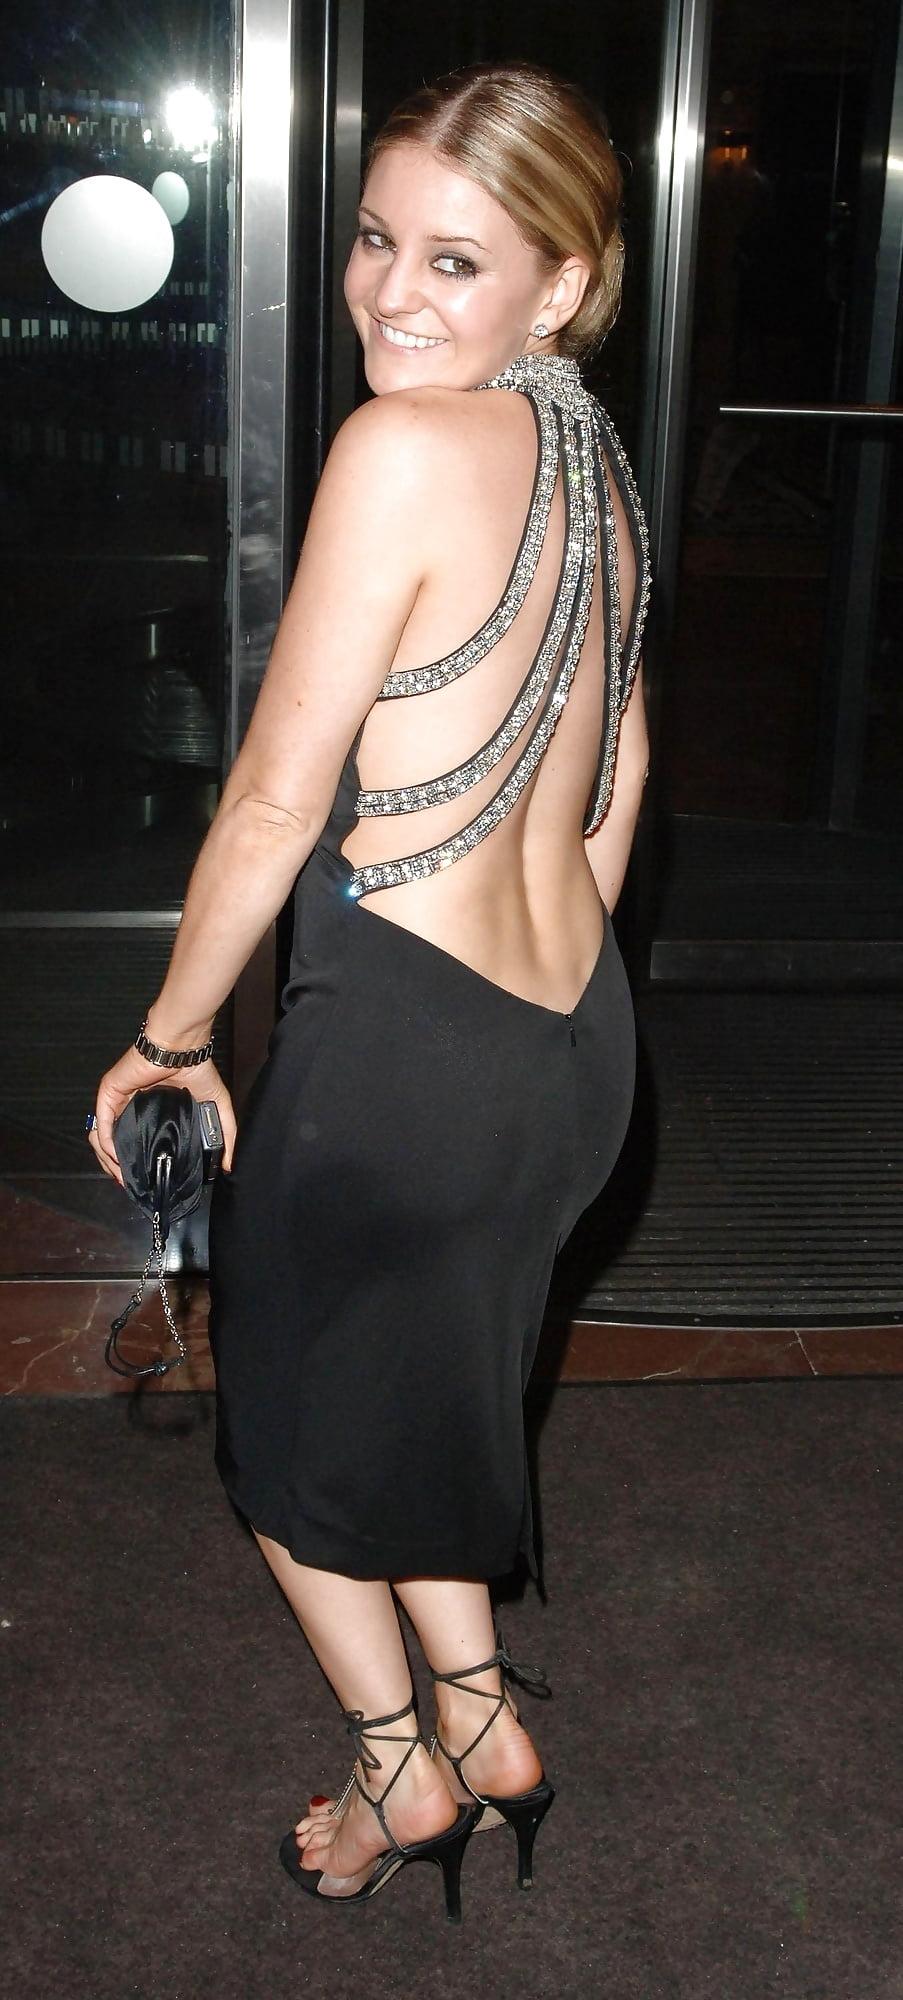 pics Nicola stapleton naked celebrity pictures